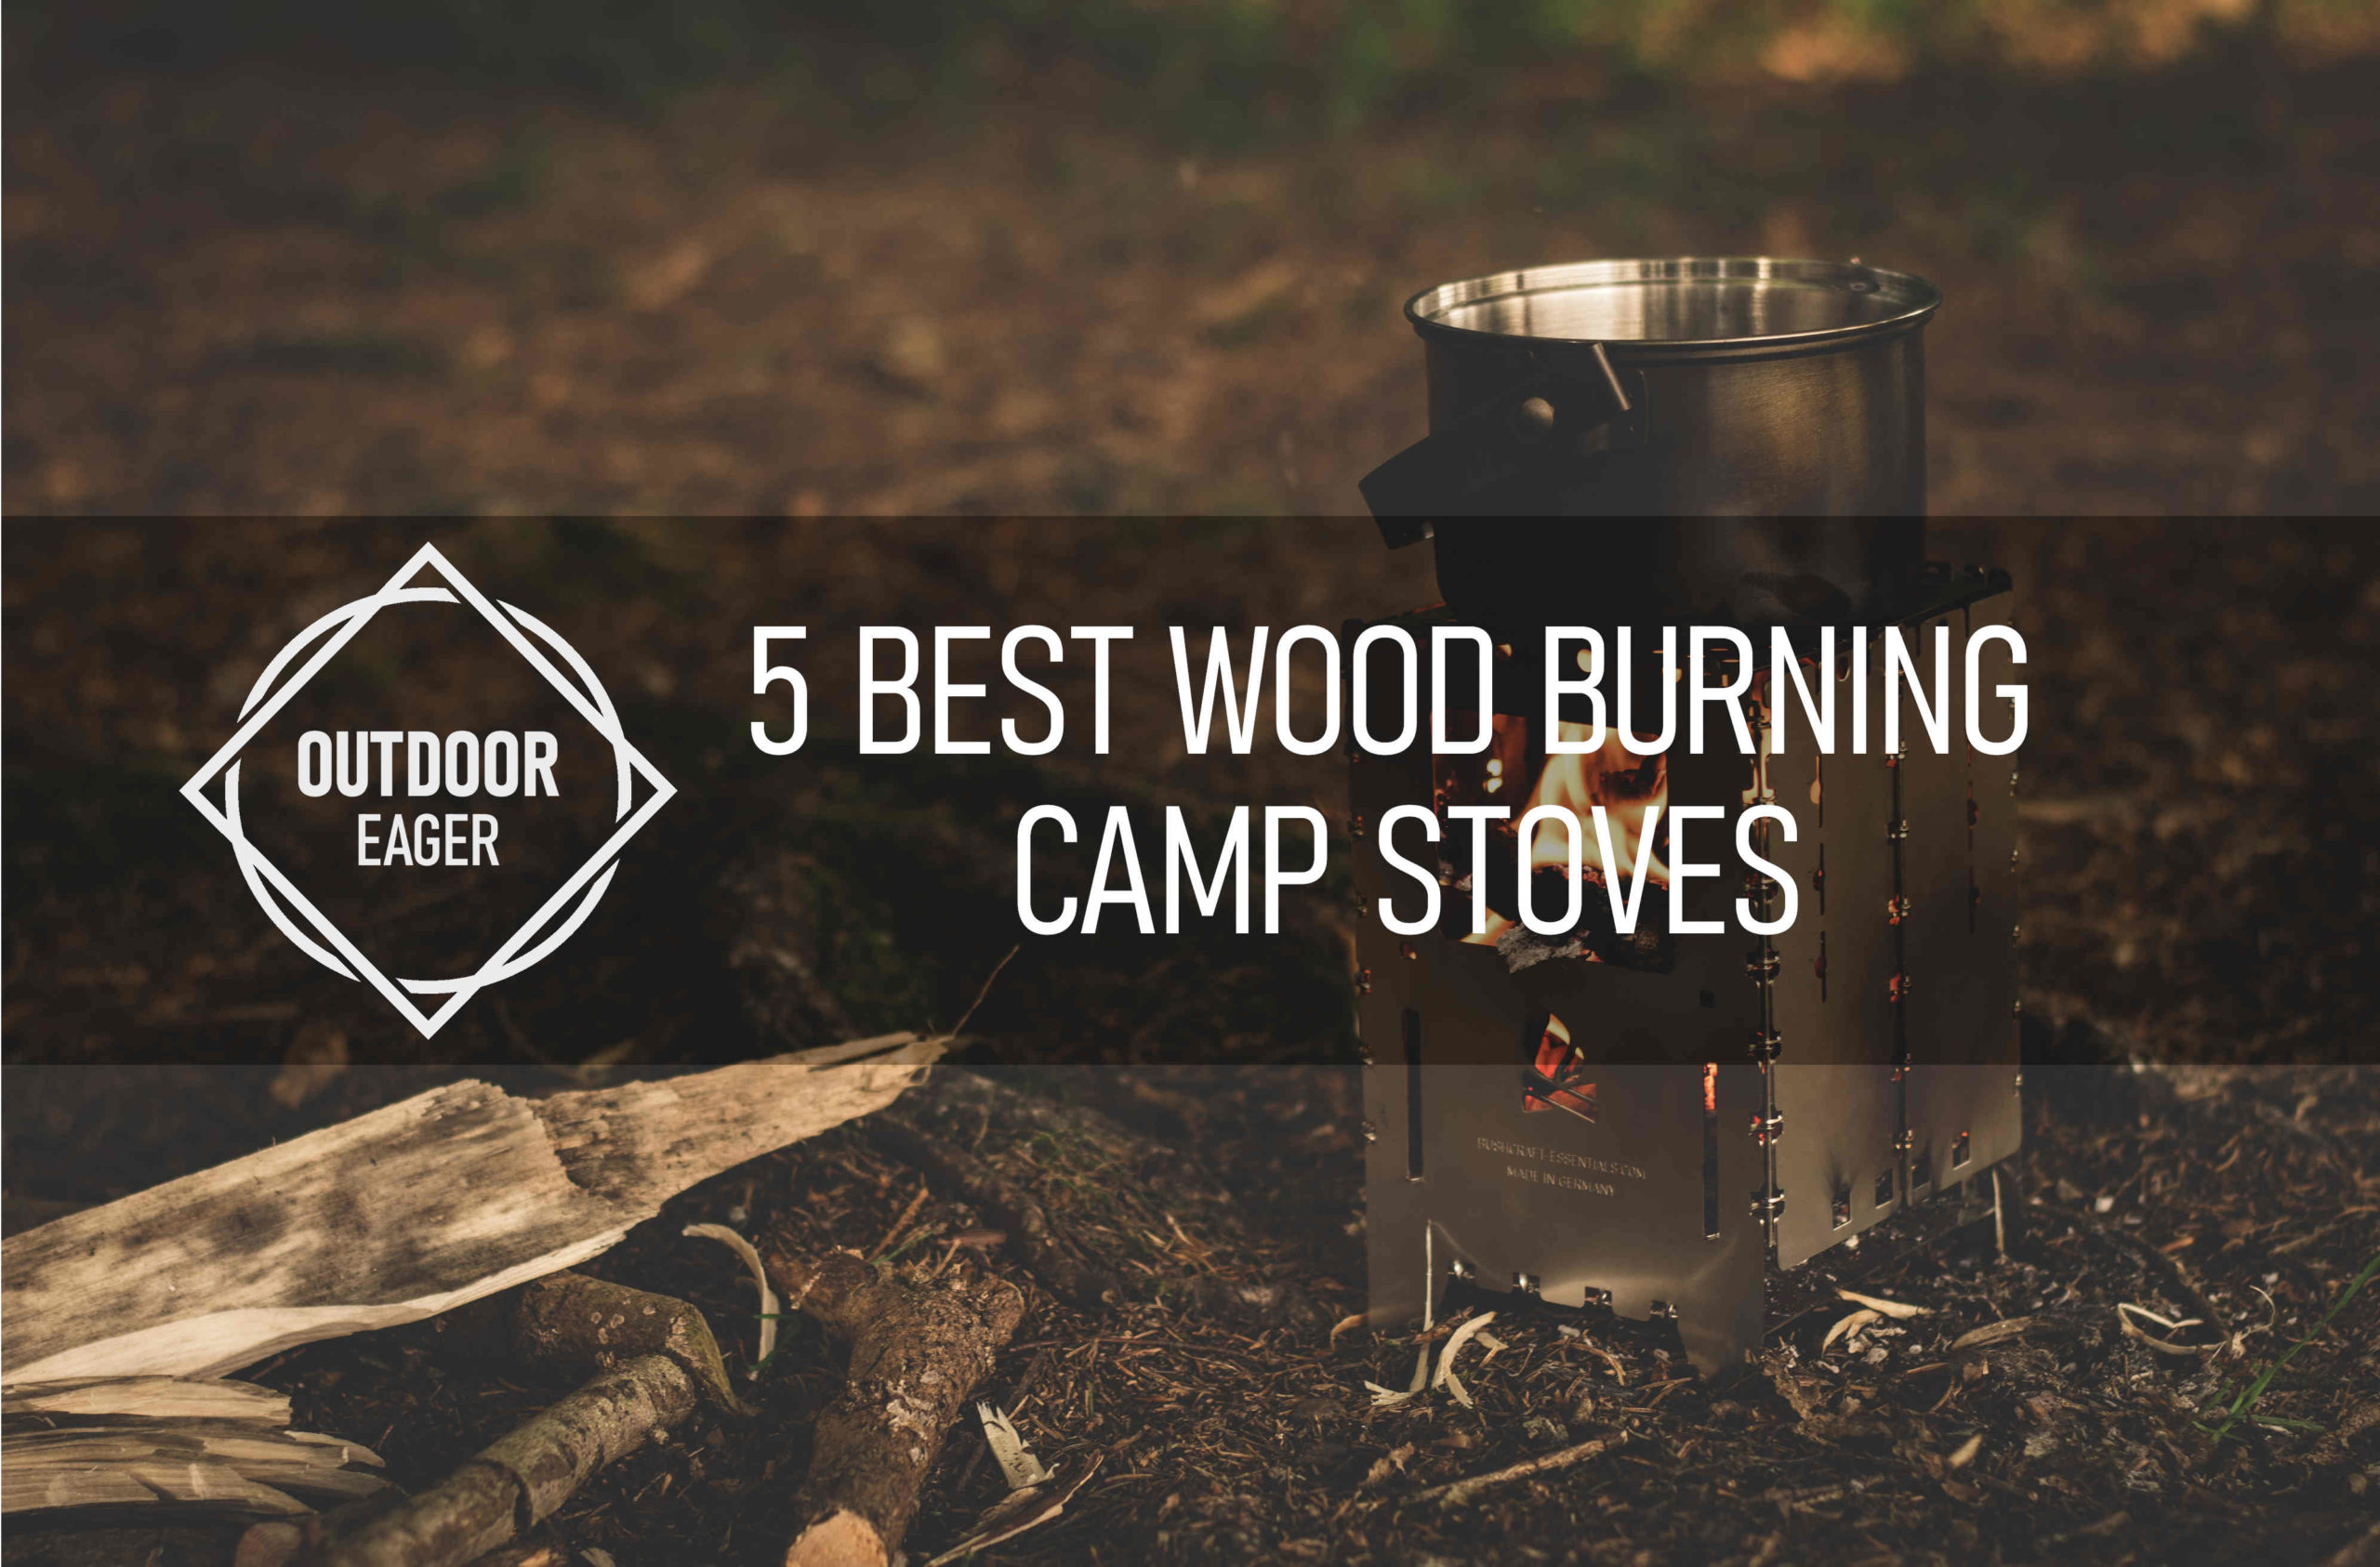 Best Wood Burning Camp Stoves